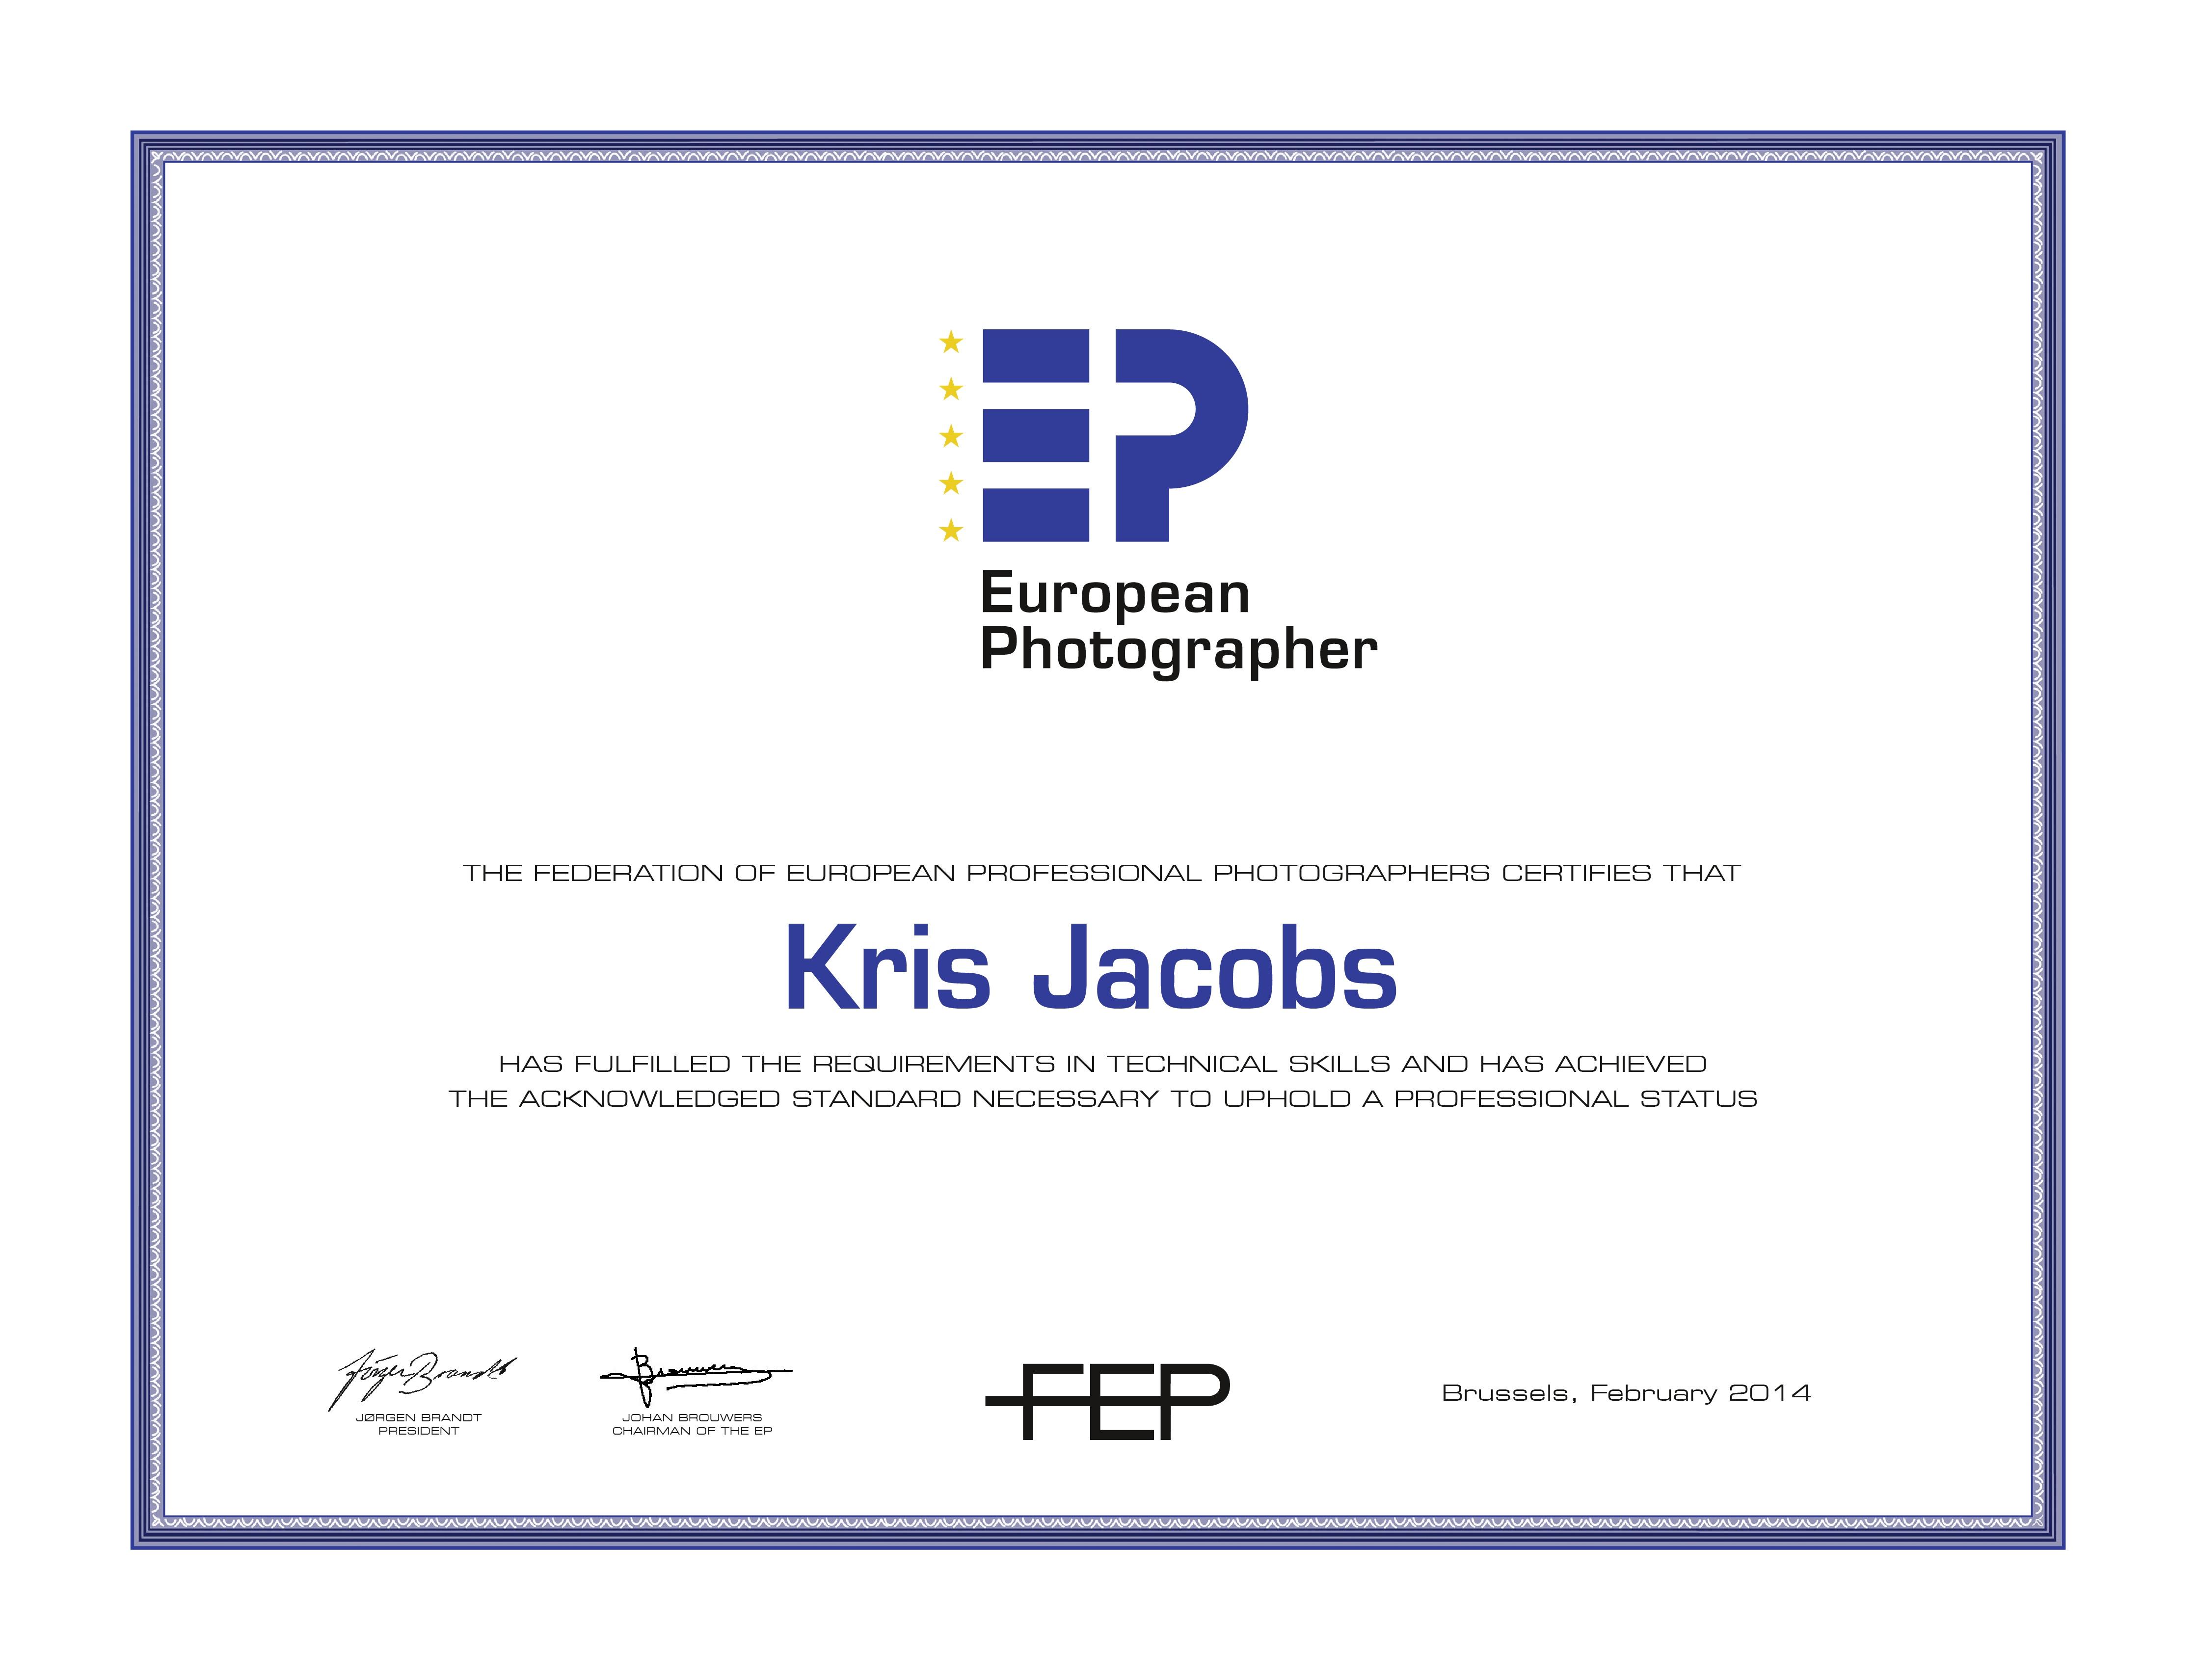 FEP Urkunden_Februar14_Kris-Jacobs